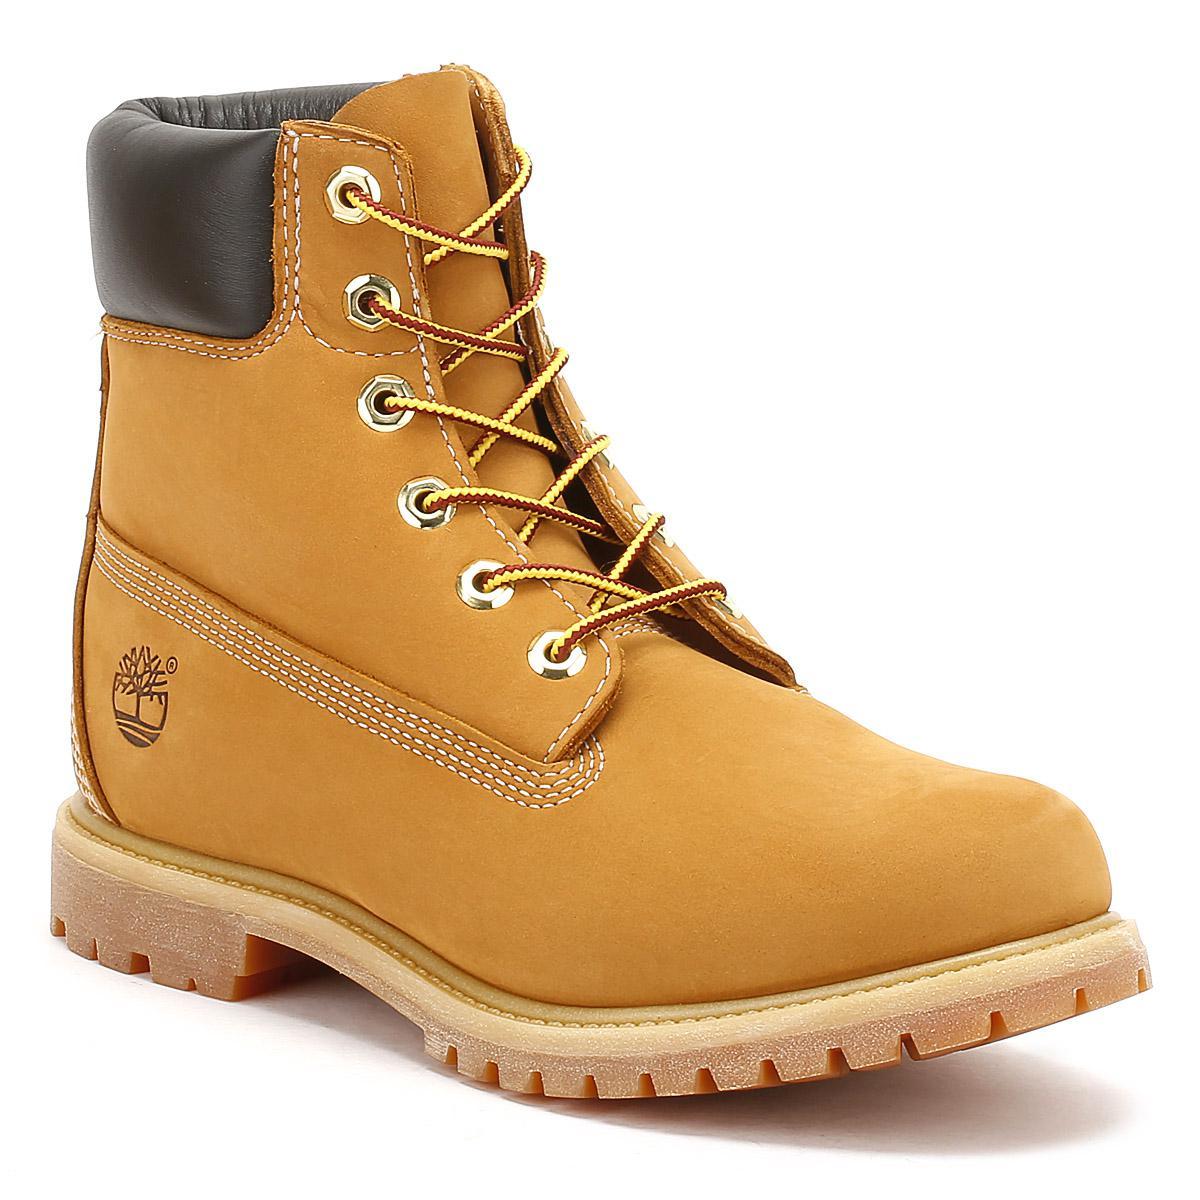 f0b47b3863cd Timberland Womens Wheat Premium 6 Inch Nubuck Leather Boots in Brown ...